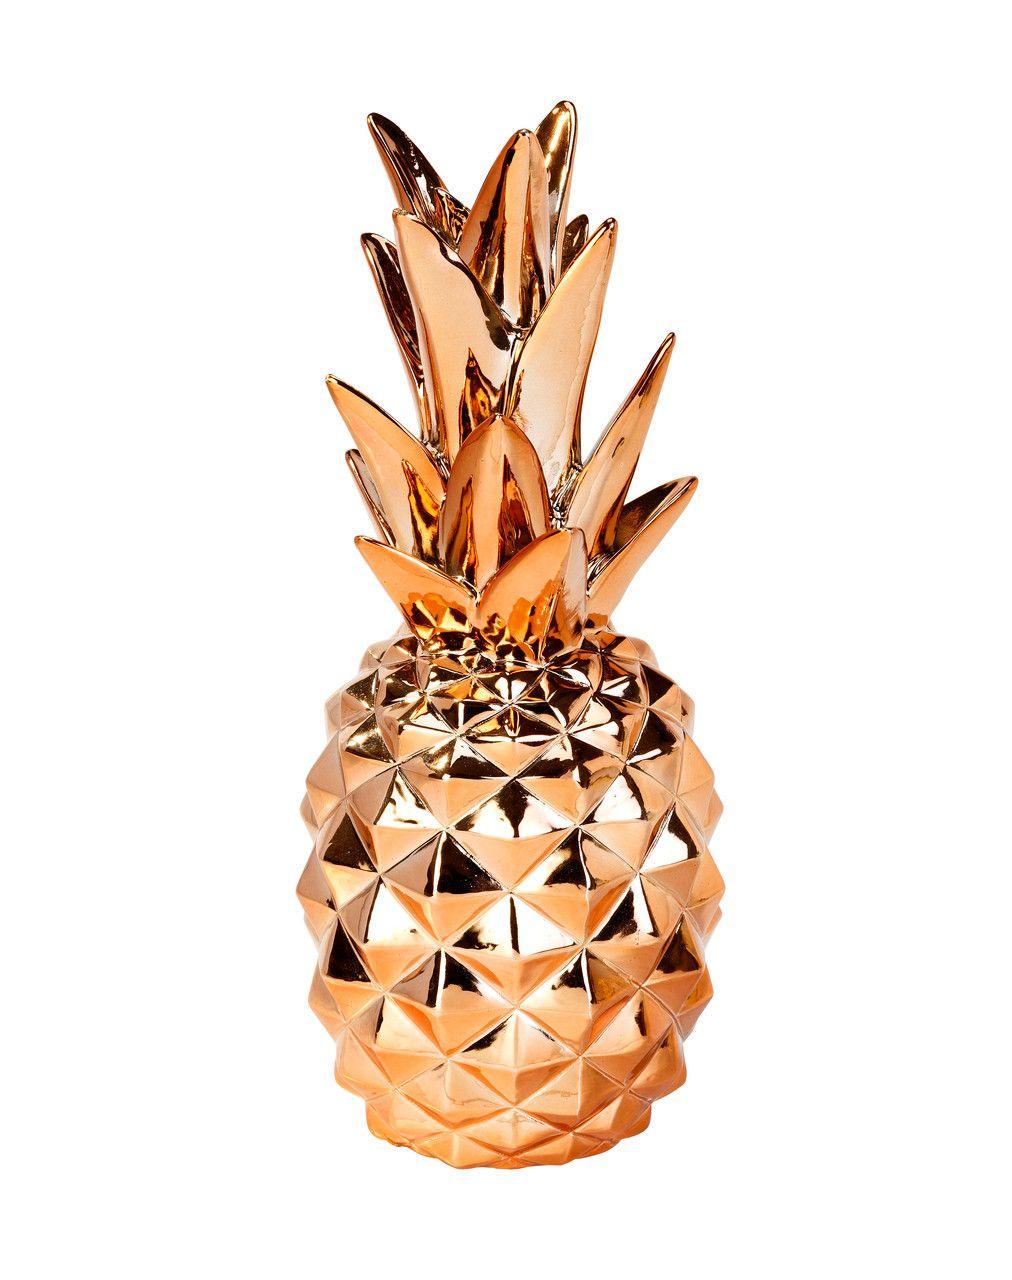 d coration ananas cuivre pineapple decoration. Black Bedroom Furniture Sets. Home Design Ideas